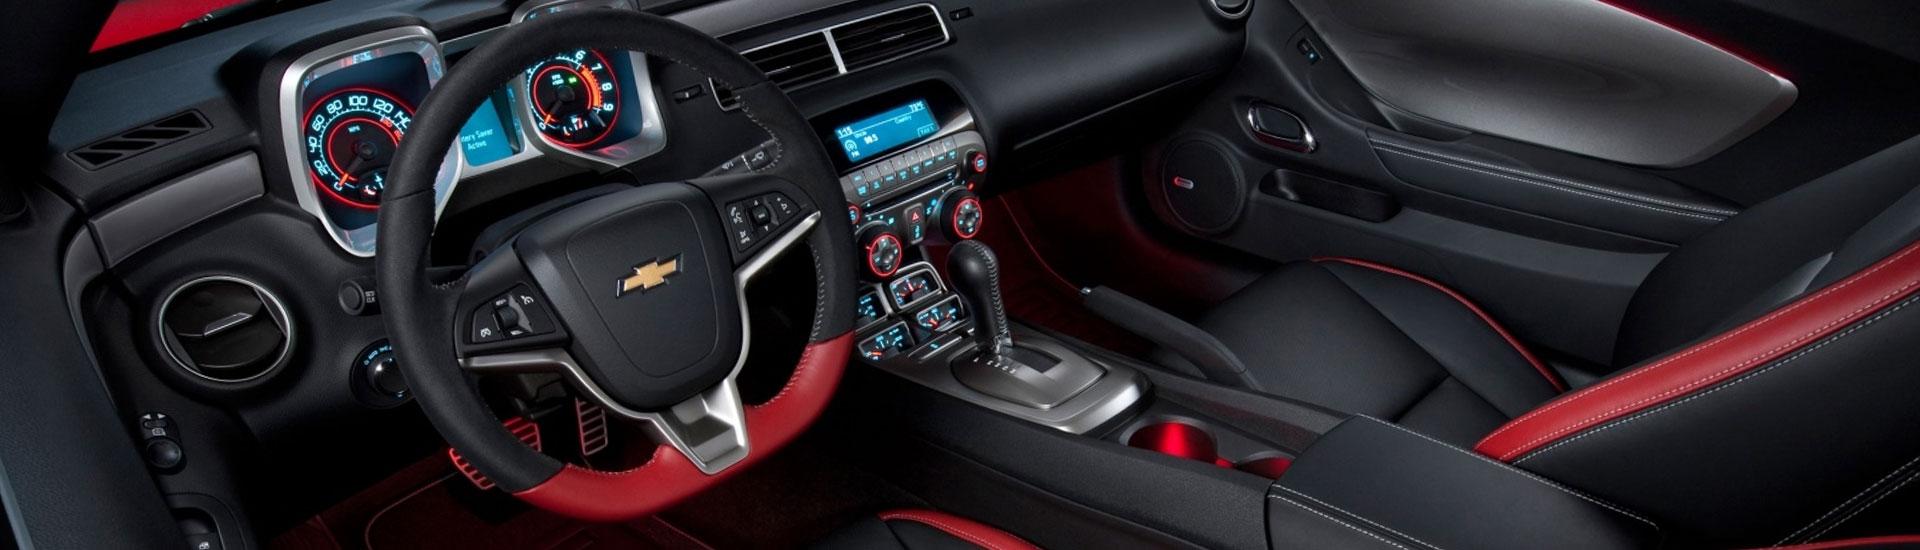 2012 Chevrolet Camaro Custom Dash Kits